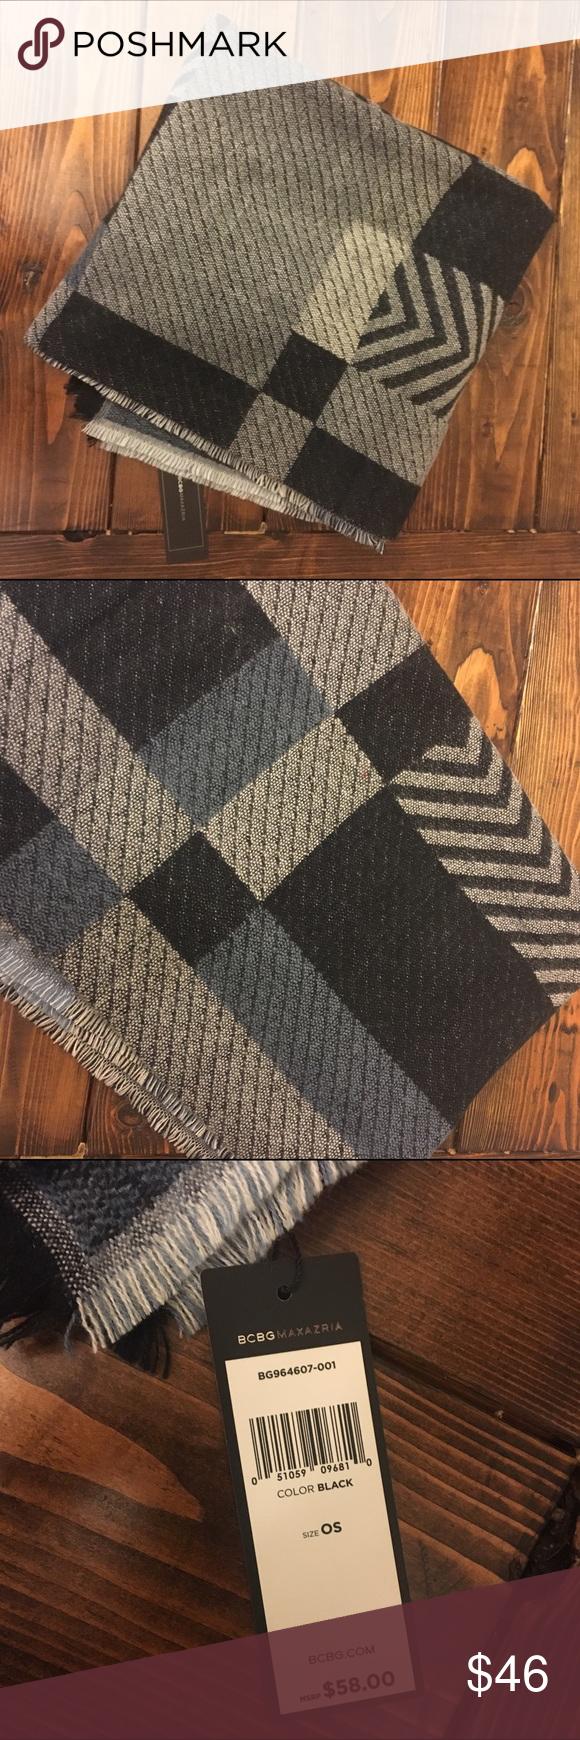 NWT BCBG Max Azria blanket scarf NWT! BCBGMaxAzria Accessories Scarves & Wraps